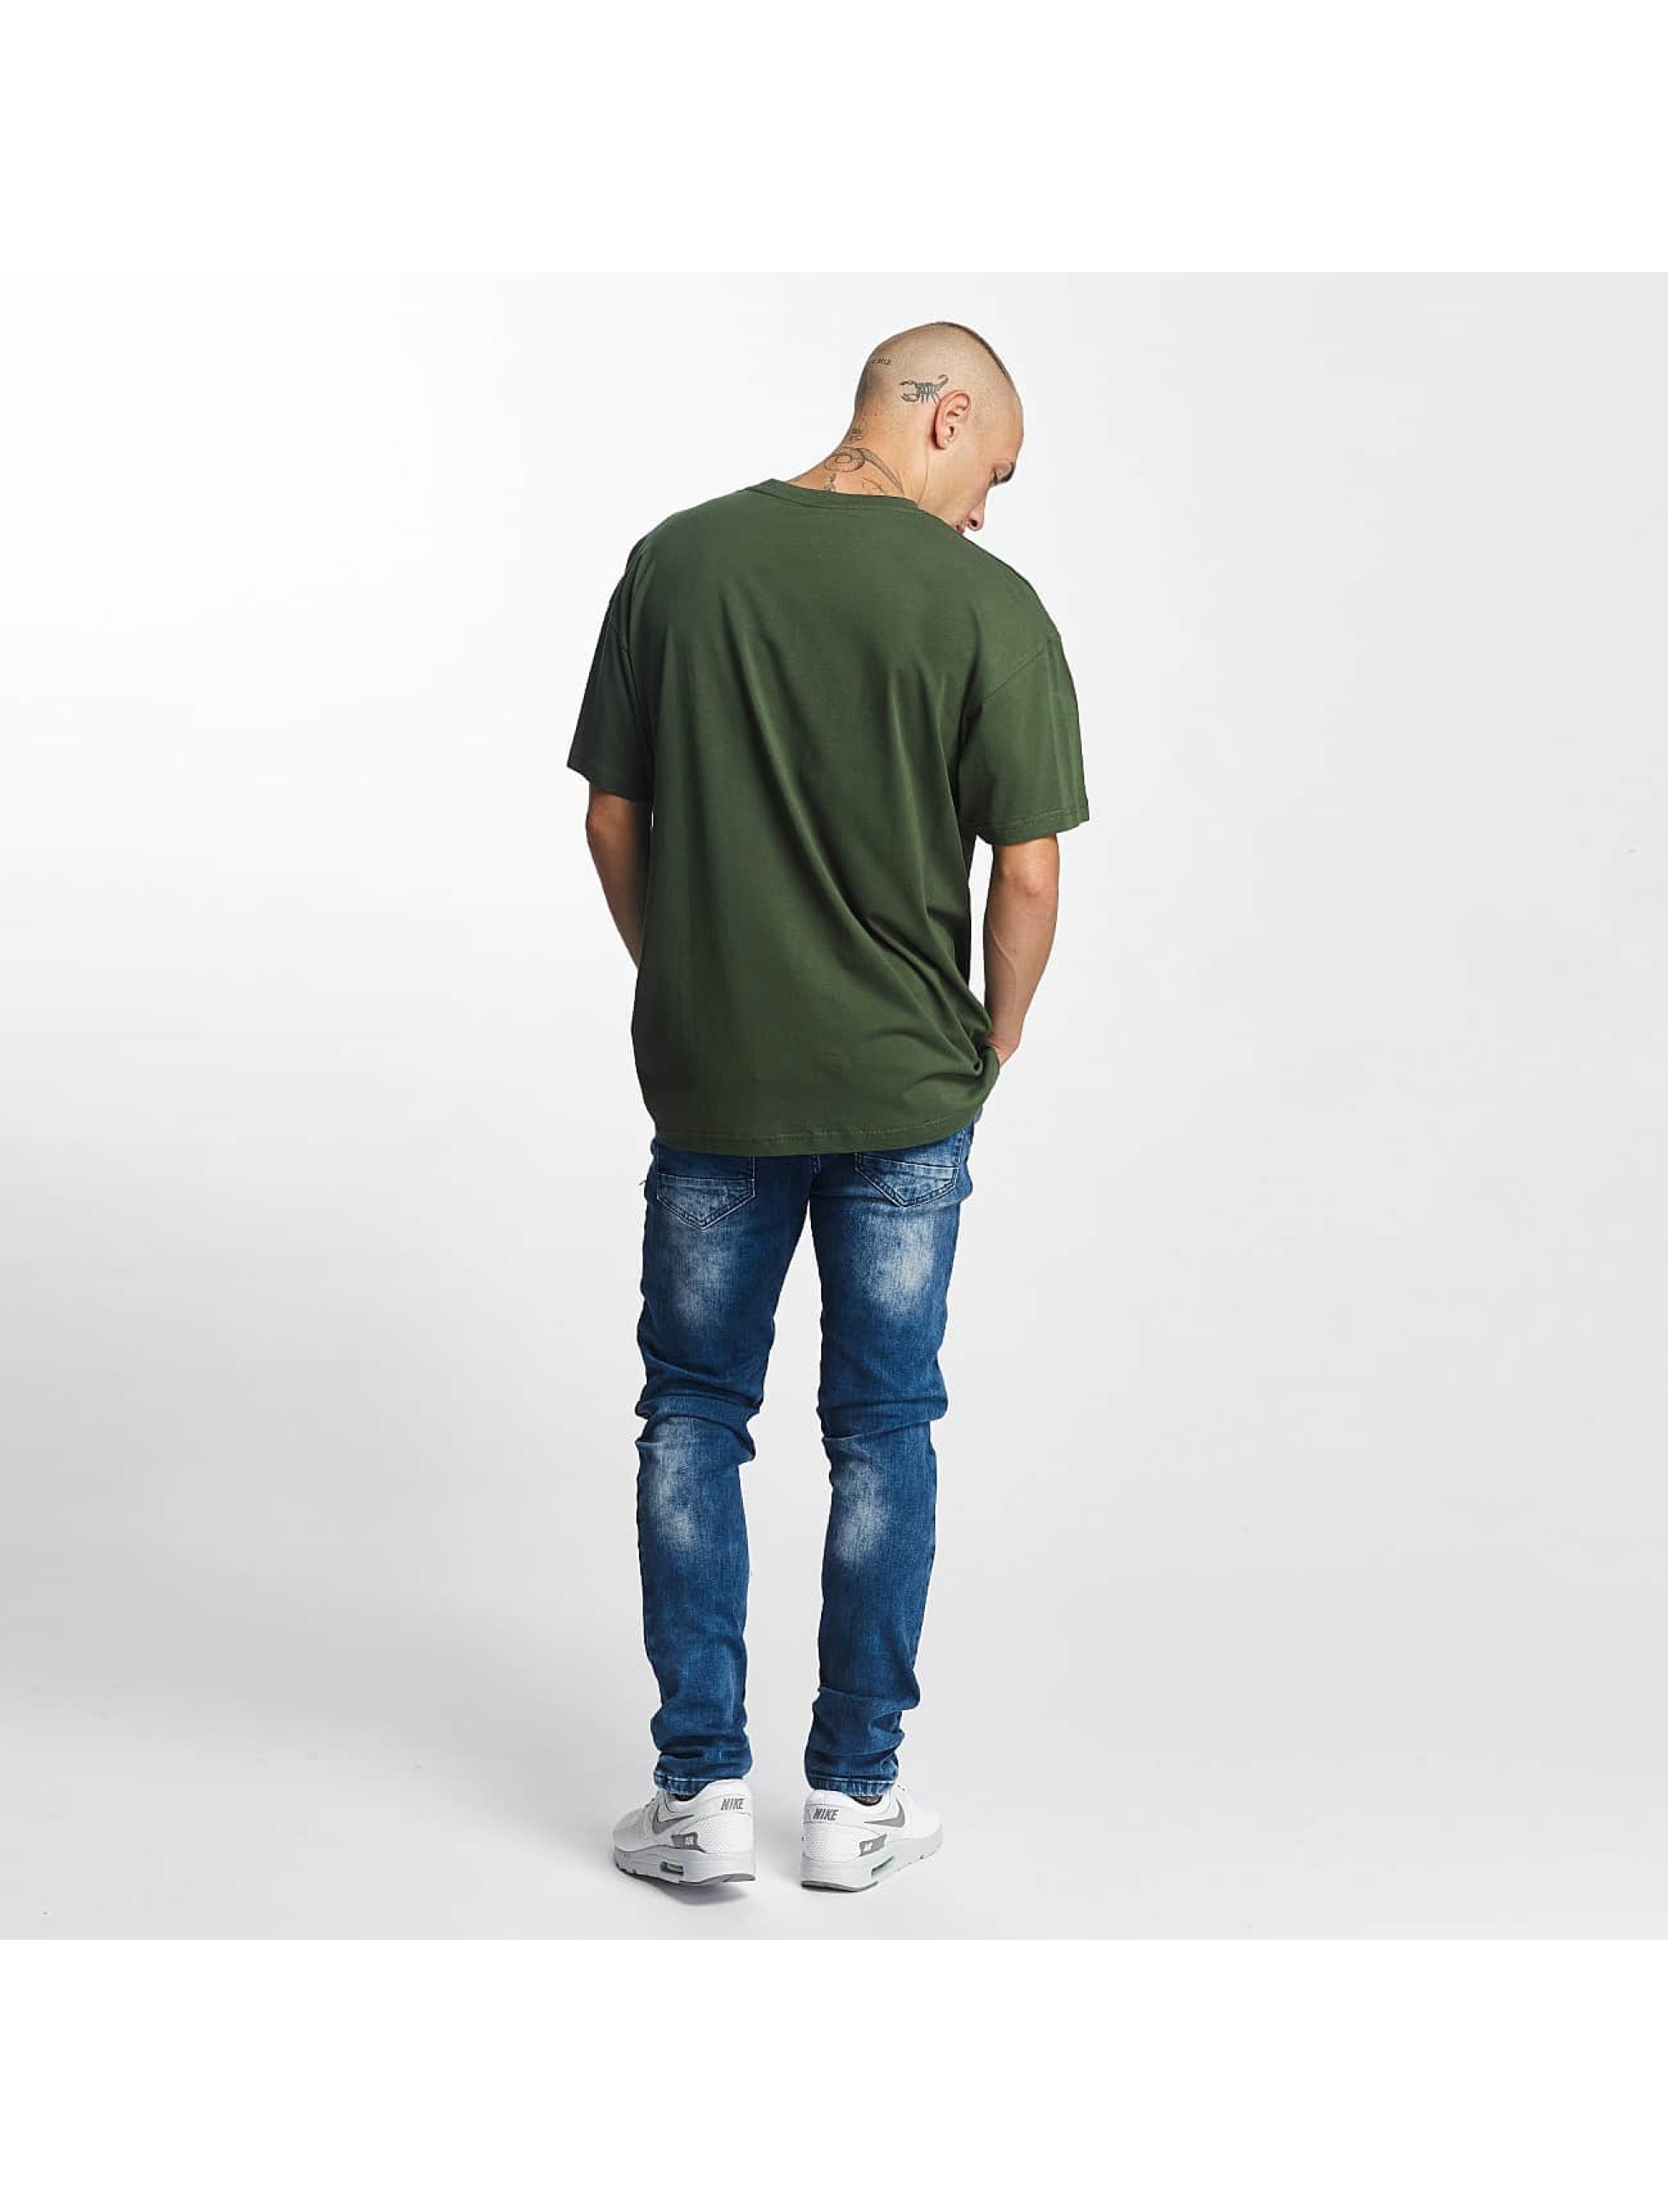 K1X T-Shirt Play Hard Basketball green